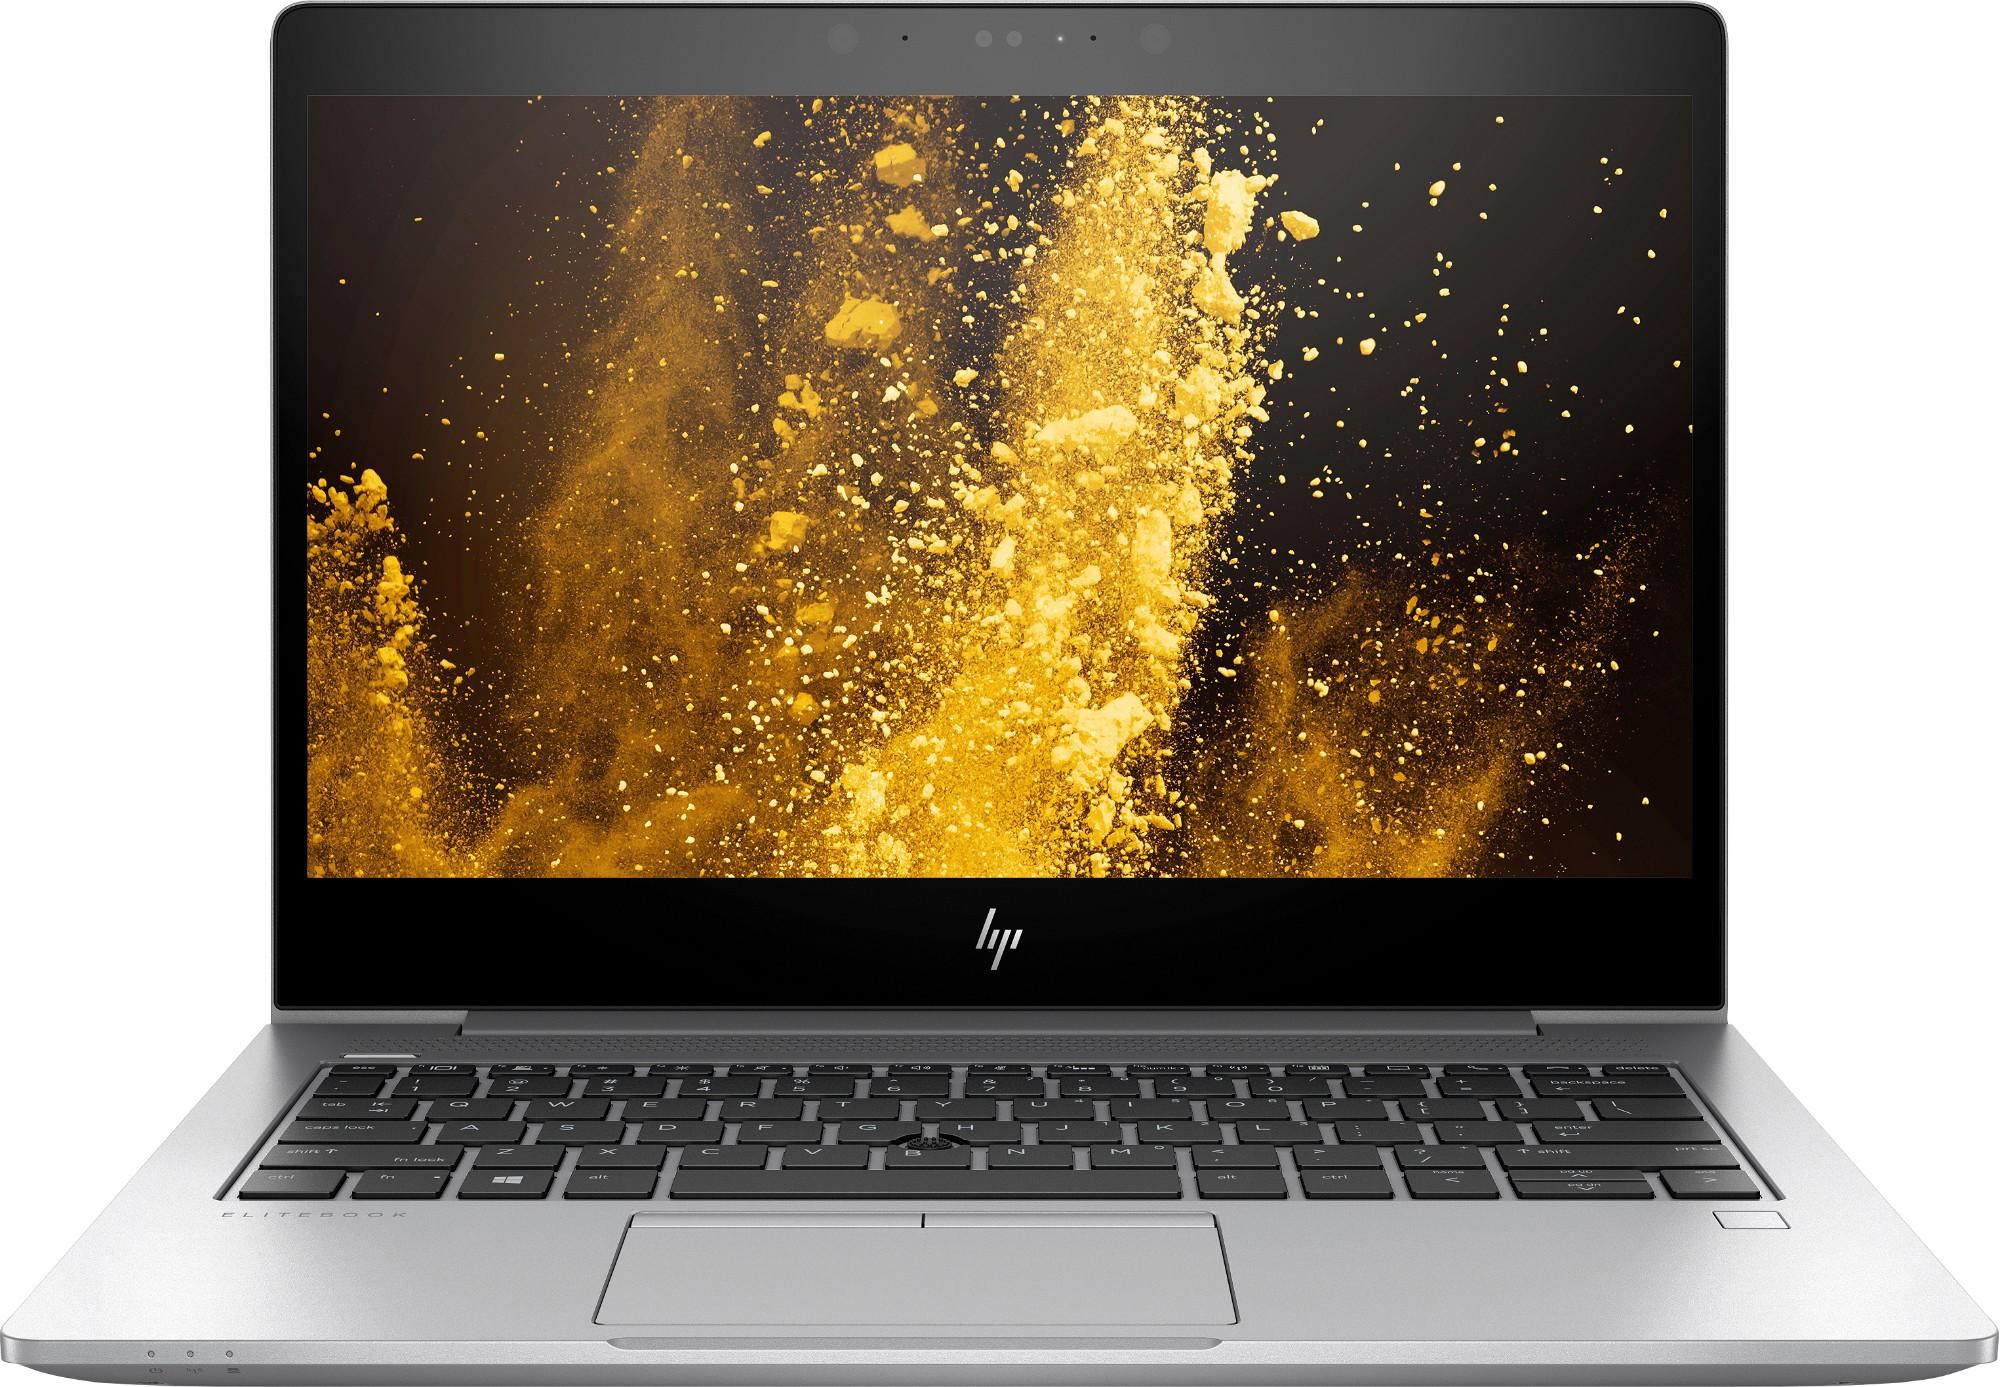 HP EliteBook 830 G5 Silver Notebook 33.8 cm (13.3